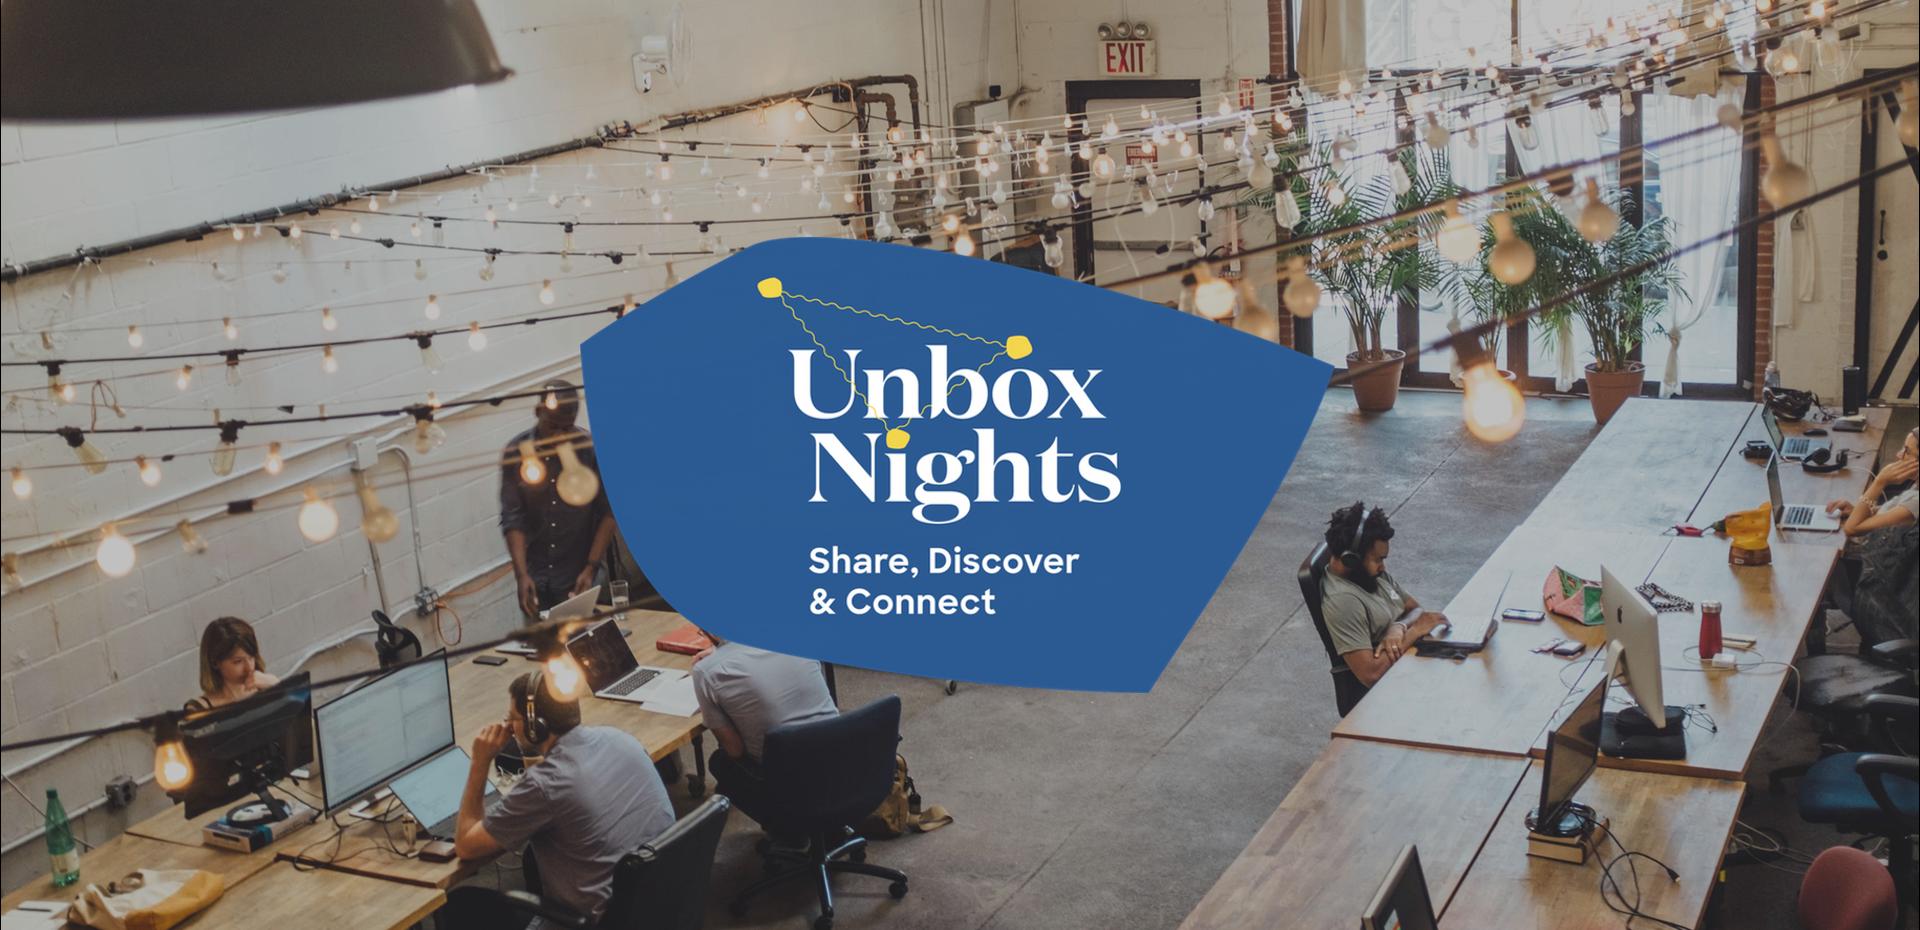 unbox-nights-2-mob-barcelona-coworking-eventos